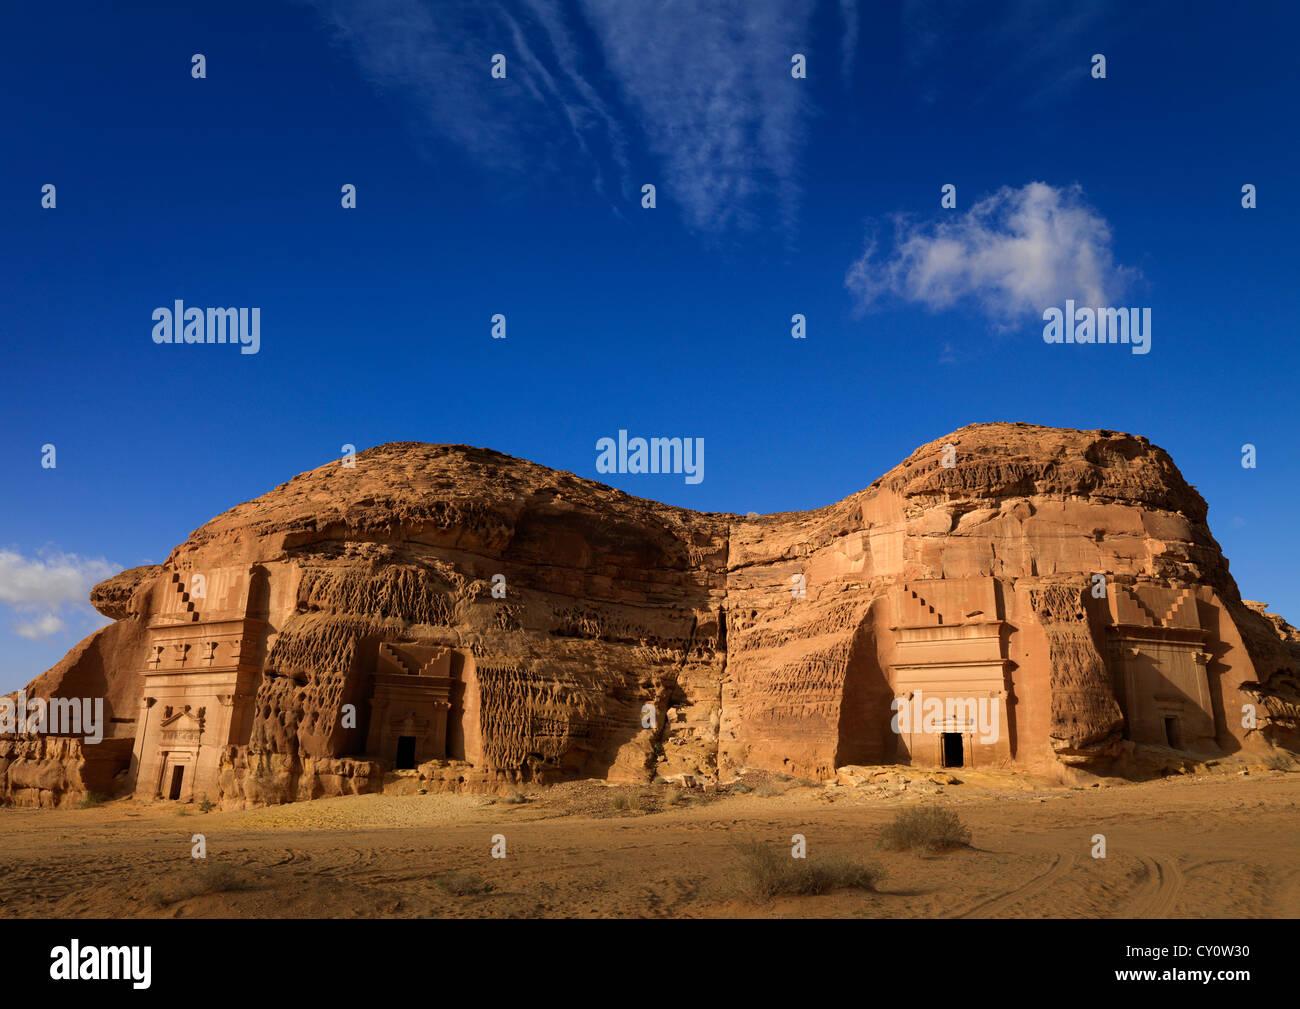 Madain Saleh emplazamiento arqueológico, Arabia Saudita Imagen De Stock